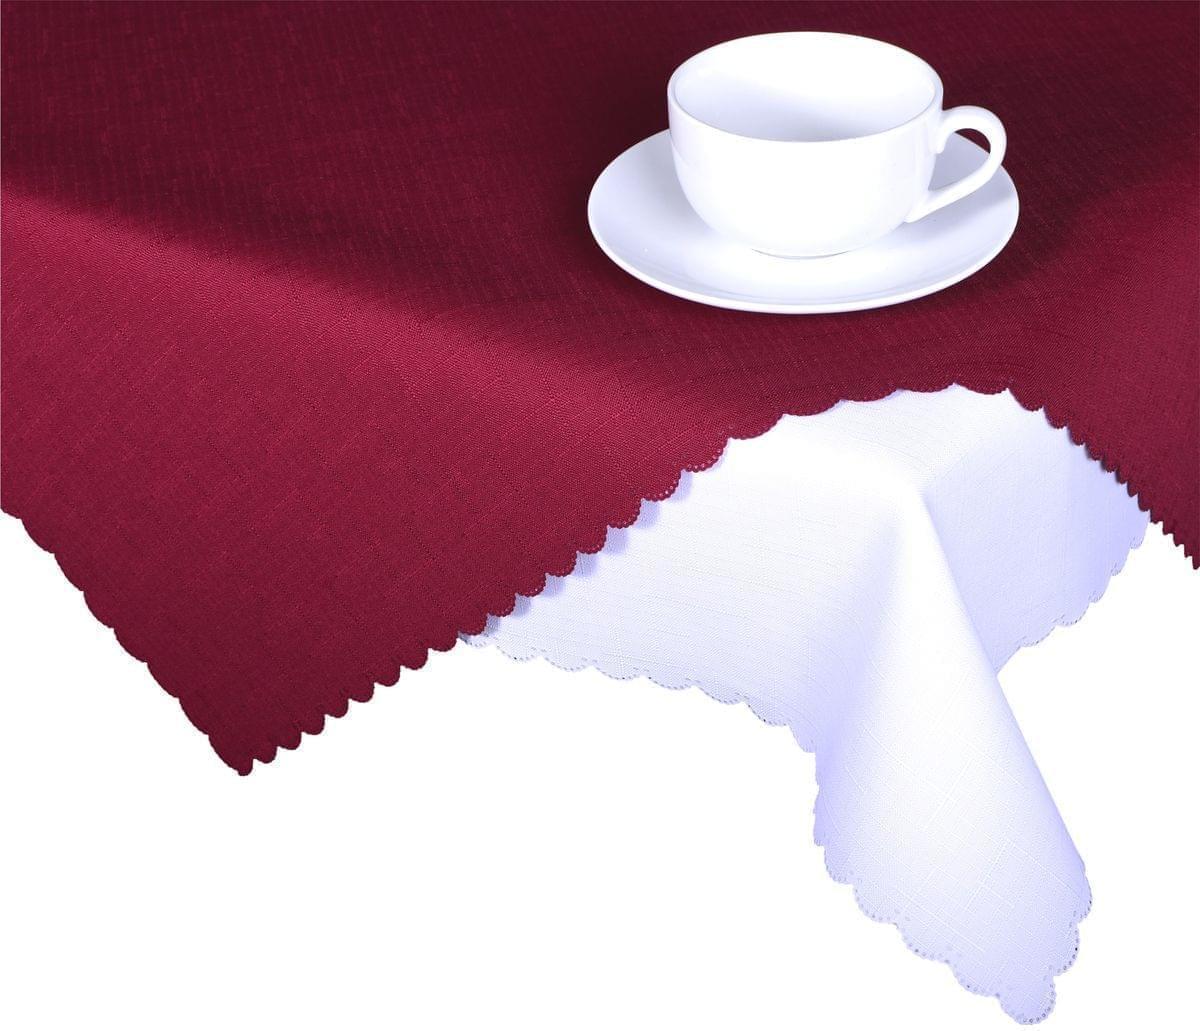 Forbyt, Ubrus s nešpinivou úpravou, Jednobarevný Deštík, bordový 160 x 220 cm